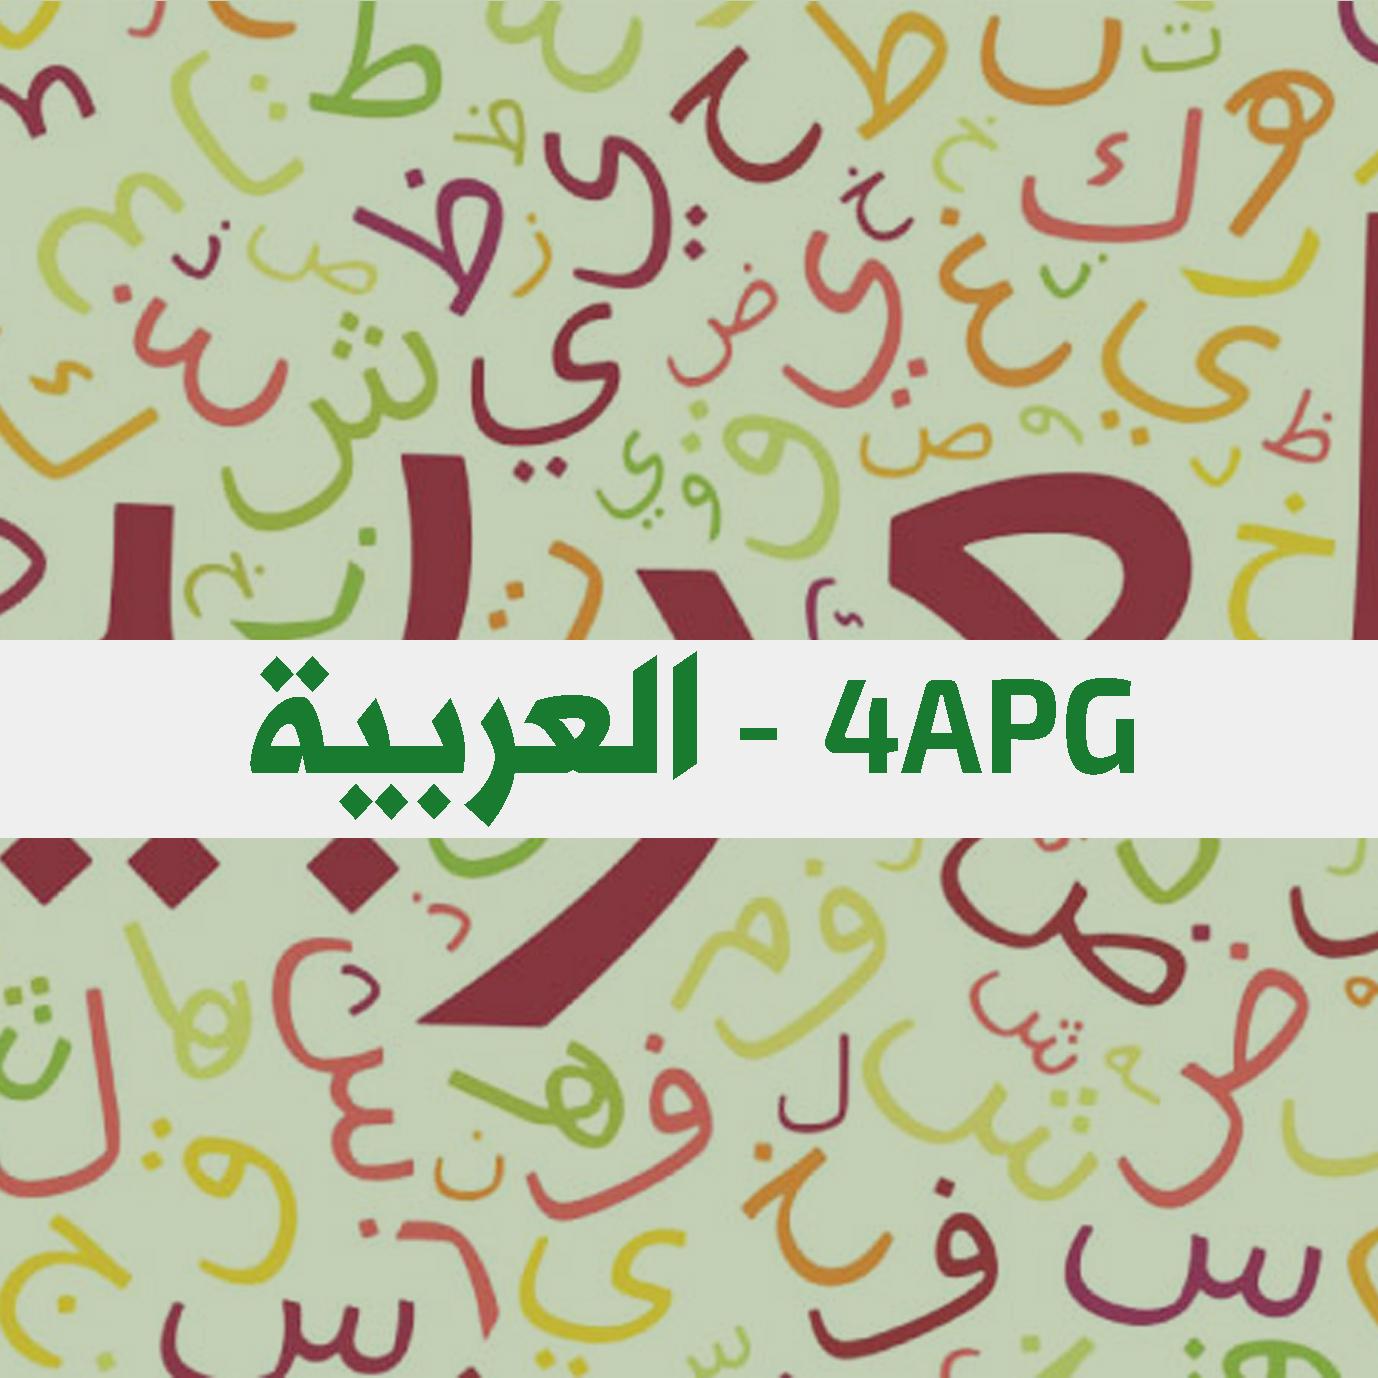 4APG-ARABE course image